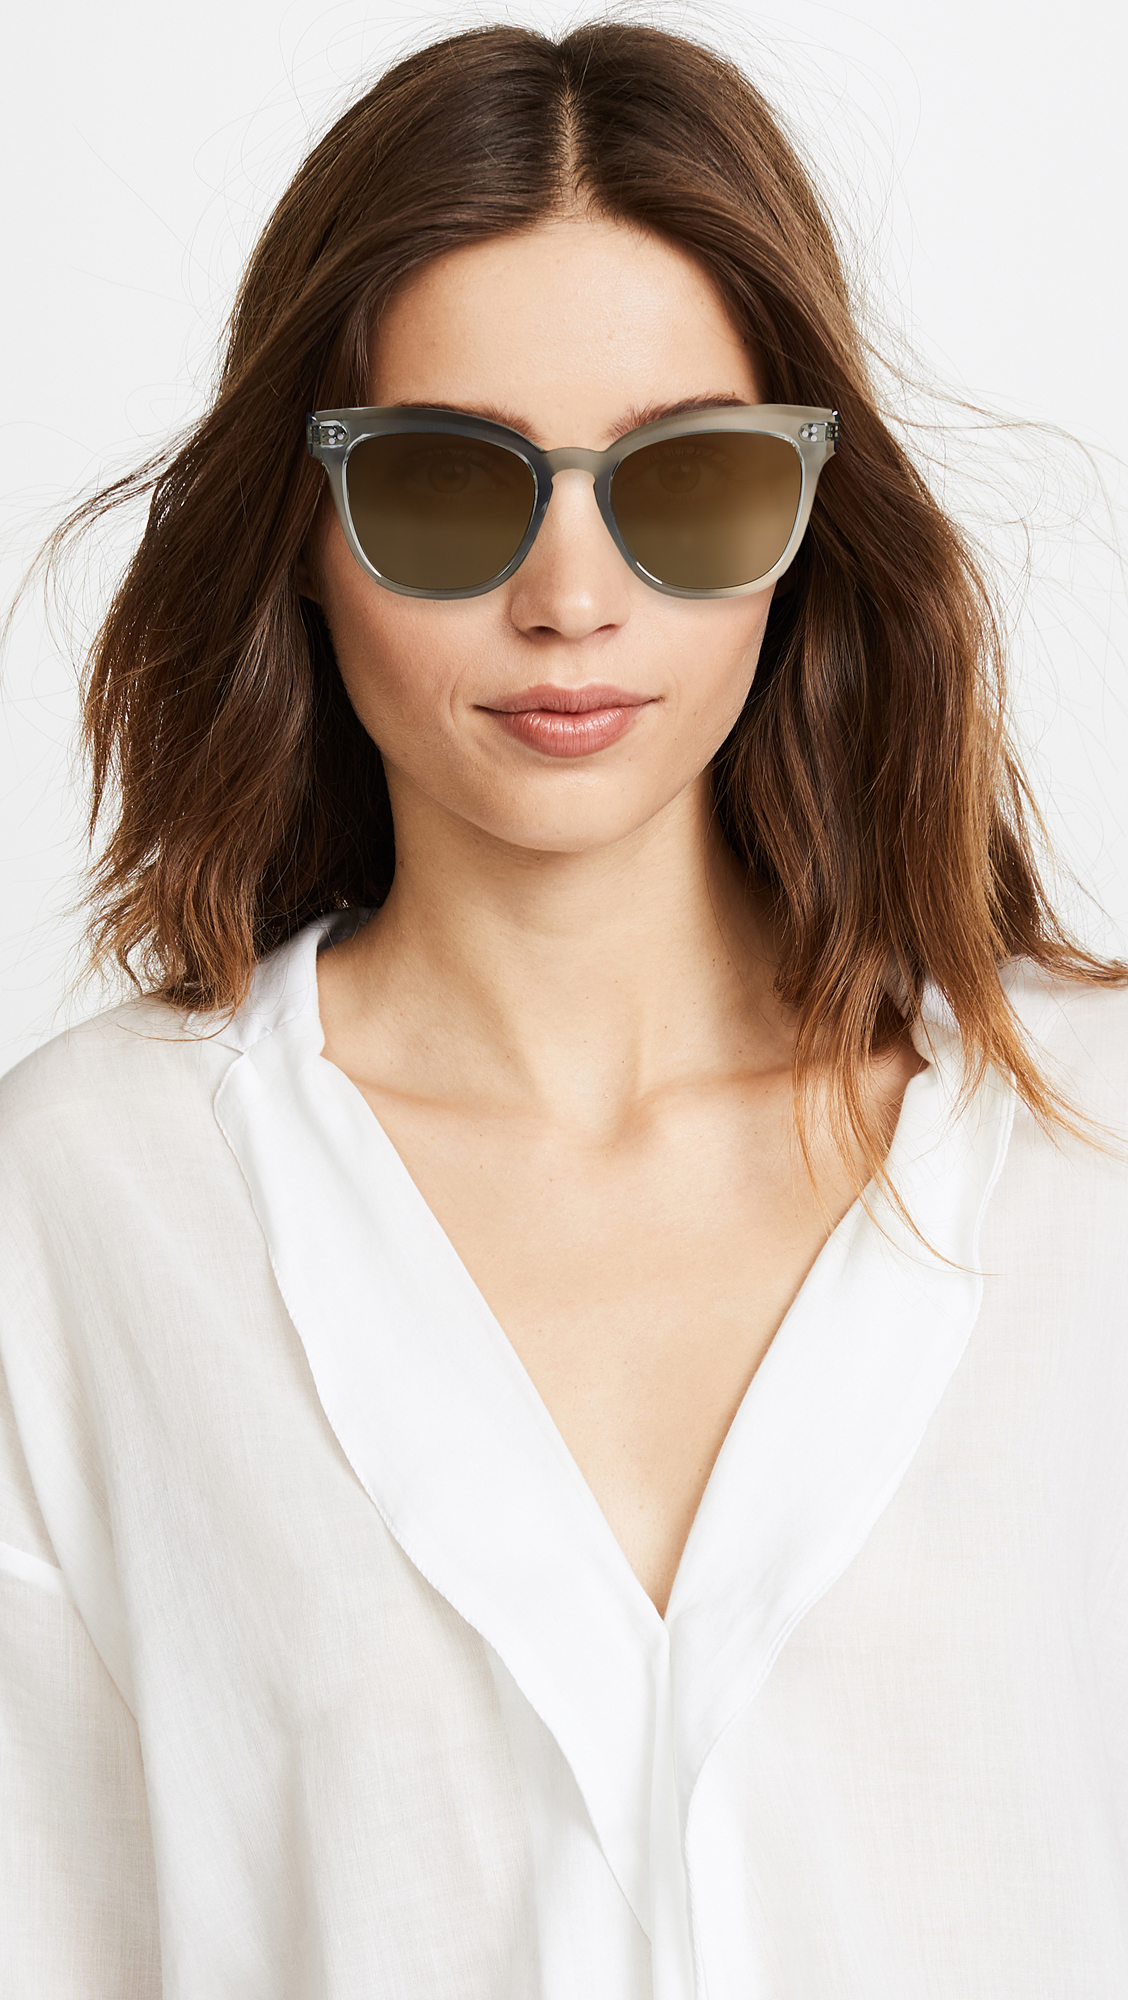 decf4a6956 Oliver Peoples Eyewear Marianela Sunglasses